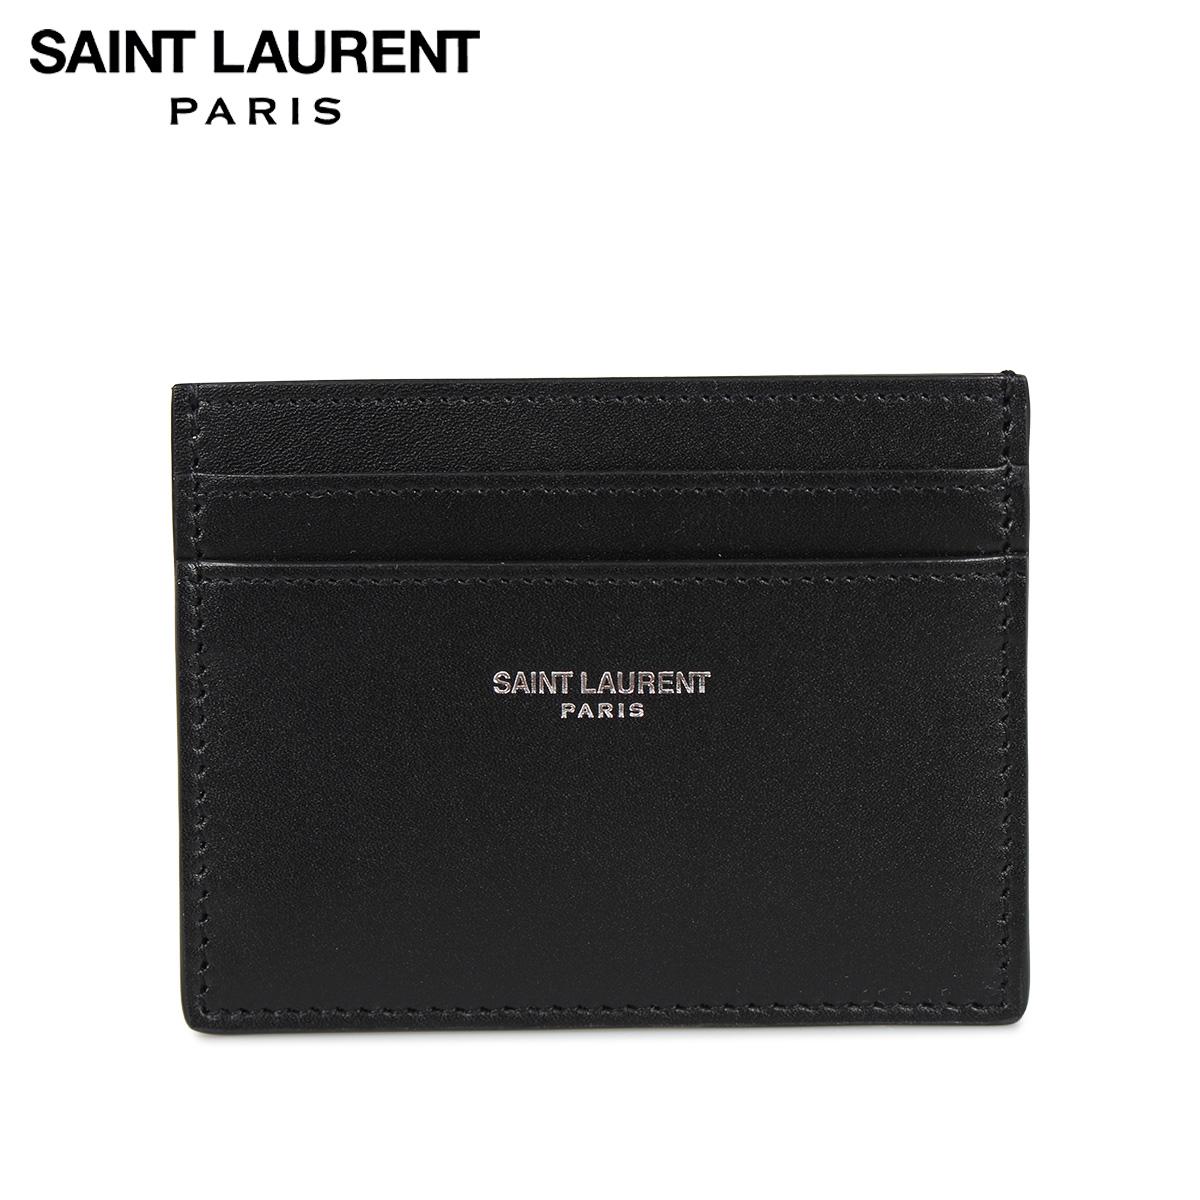 SAINT LAURENT PARIS サンローラン パリ パスケース カードケース ID 定期入れ メンズ 本革 YSL CREDIT CARD CASE ブラック 黒 3759460U90N